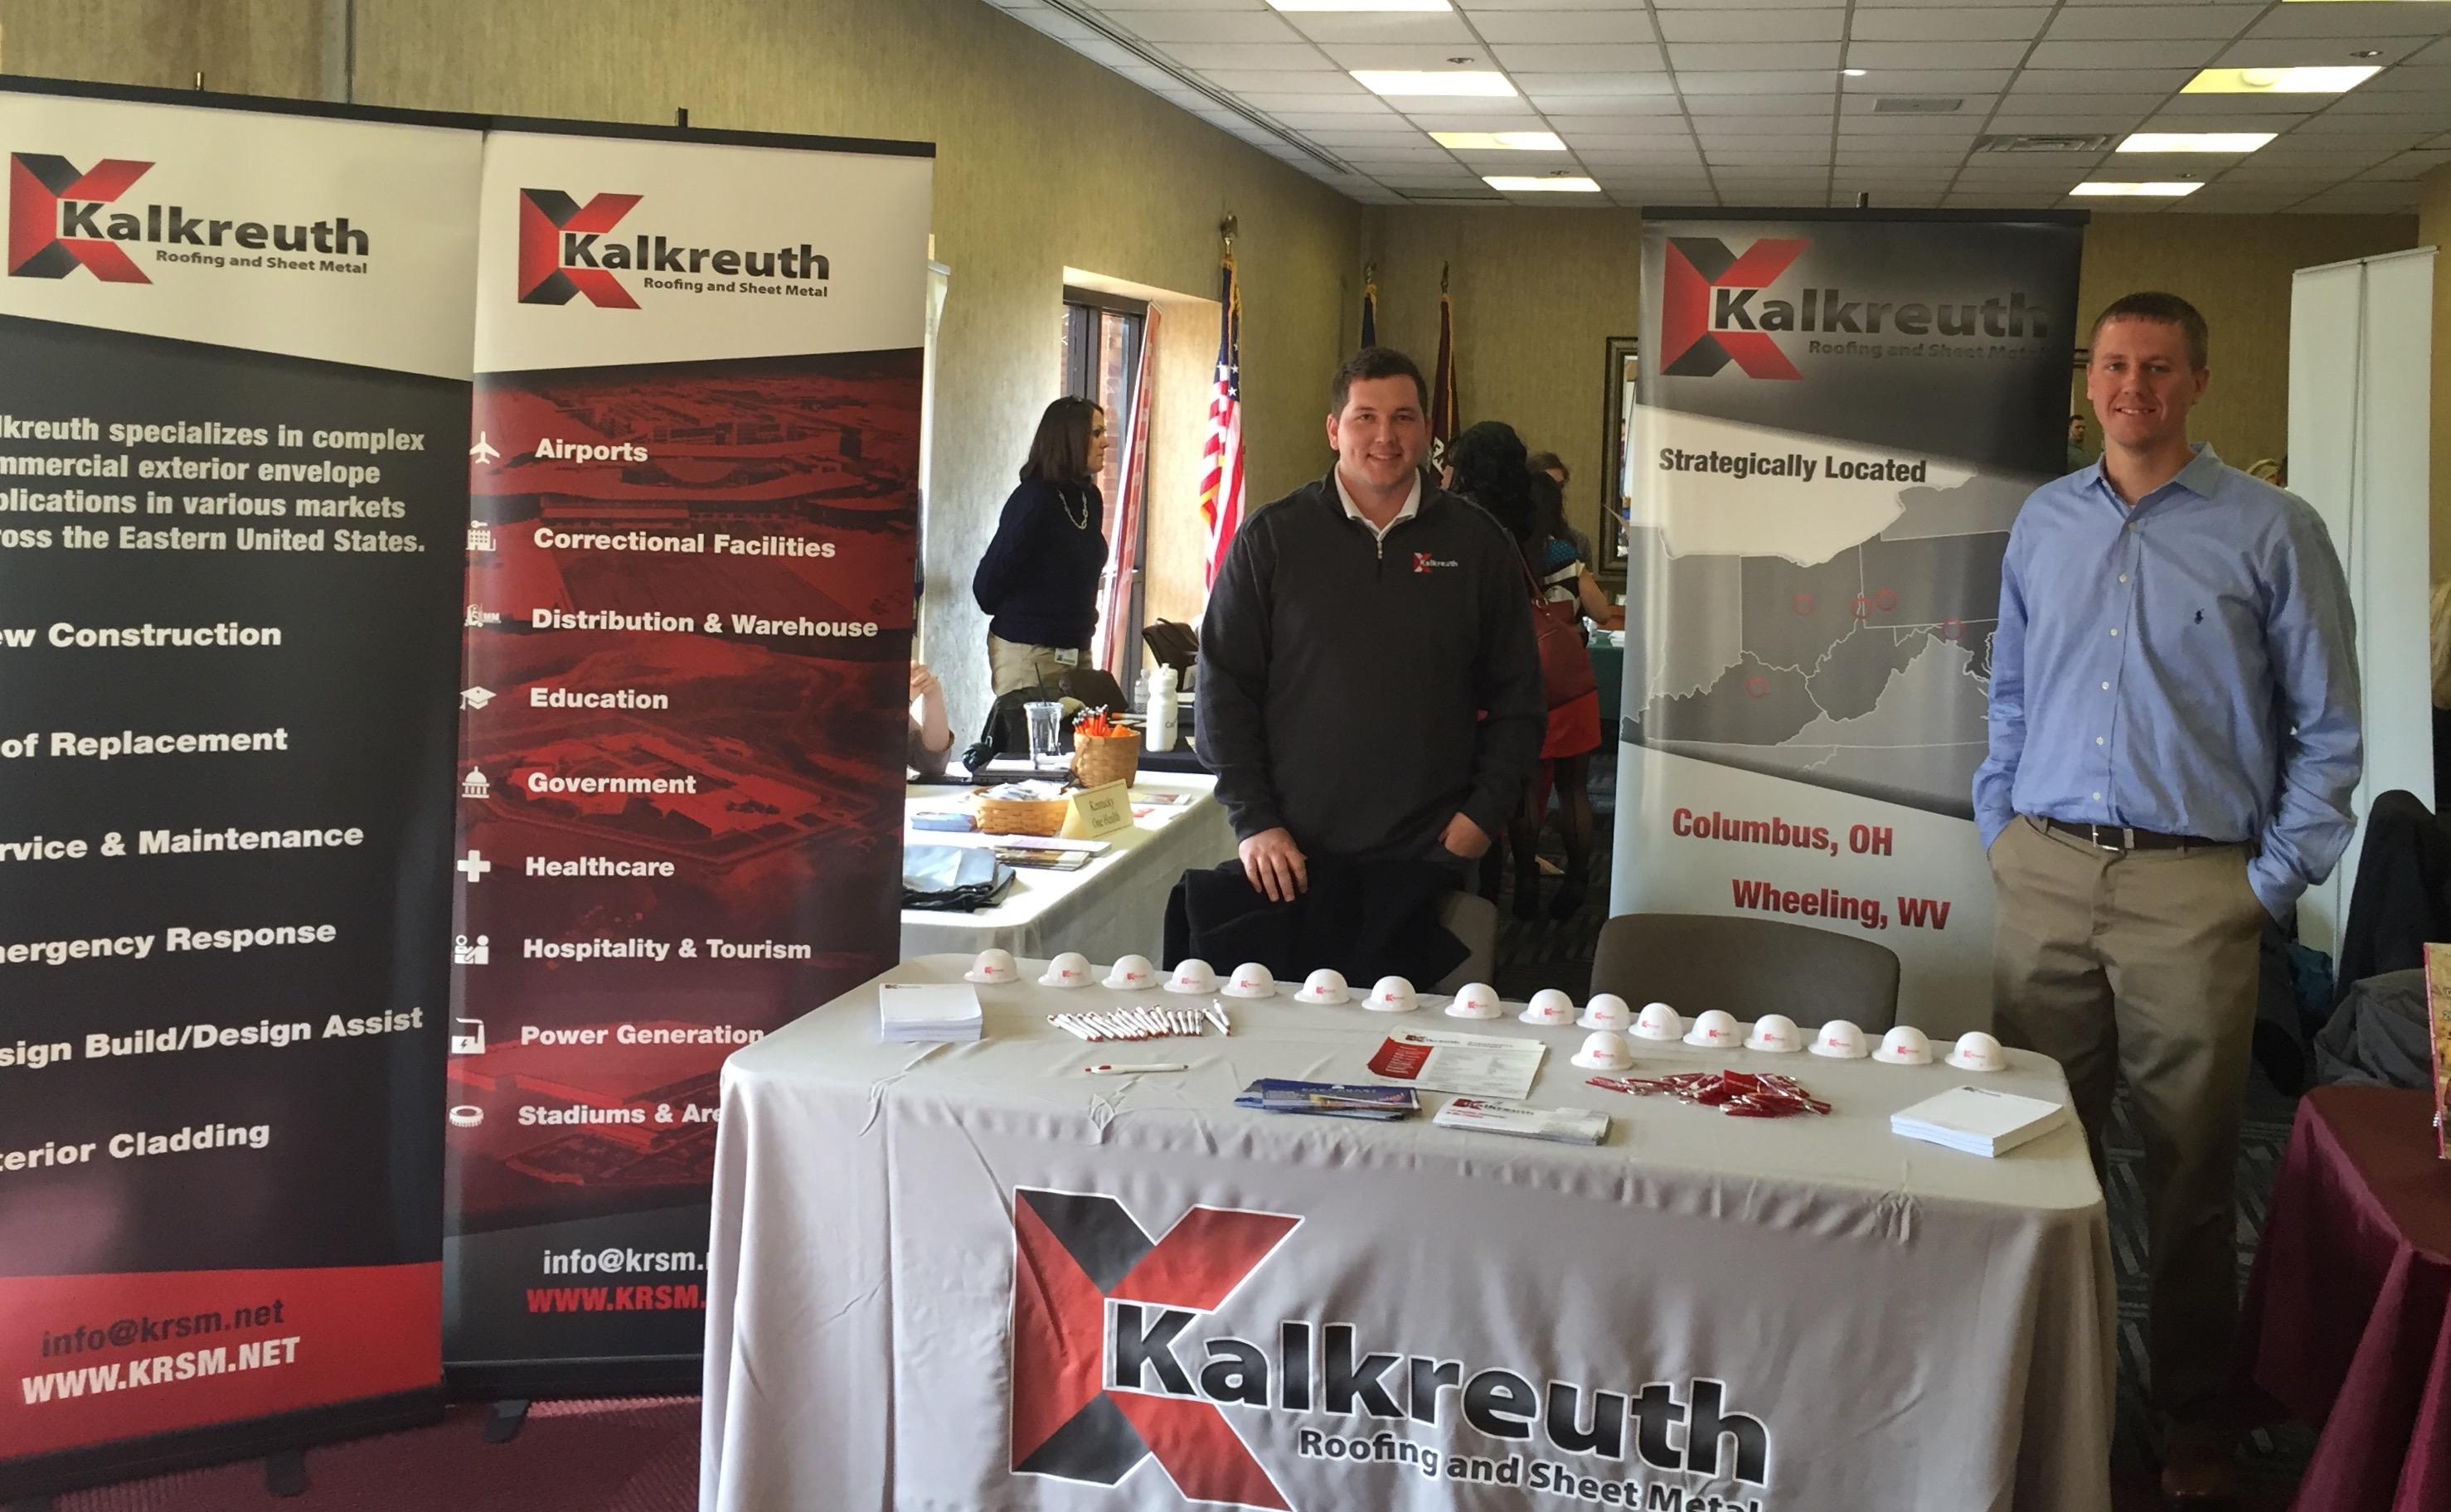 Recruiting At Eku Kalkreuth Roofing And Sheet Metal